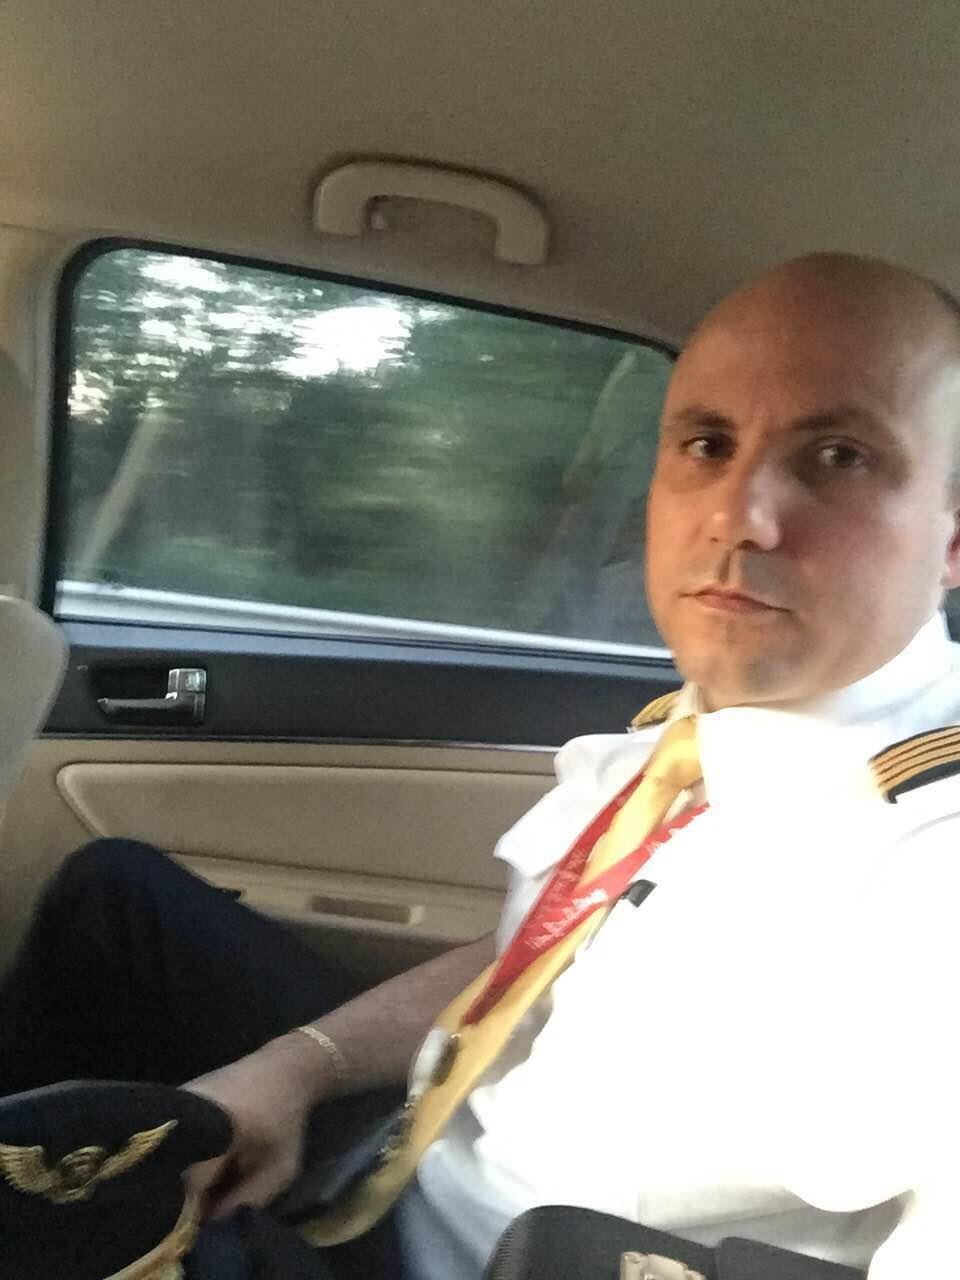 Belmiro Amaro, piloto brasileiro, mudou-se para Pequim há 11 meses.